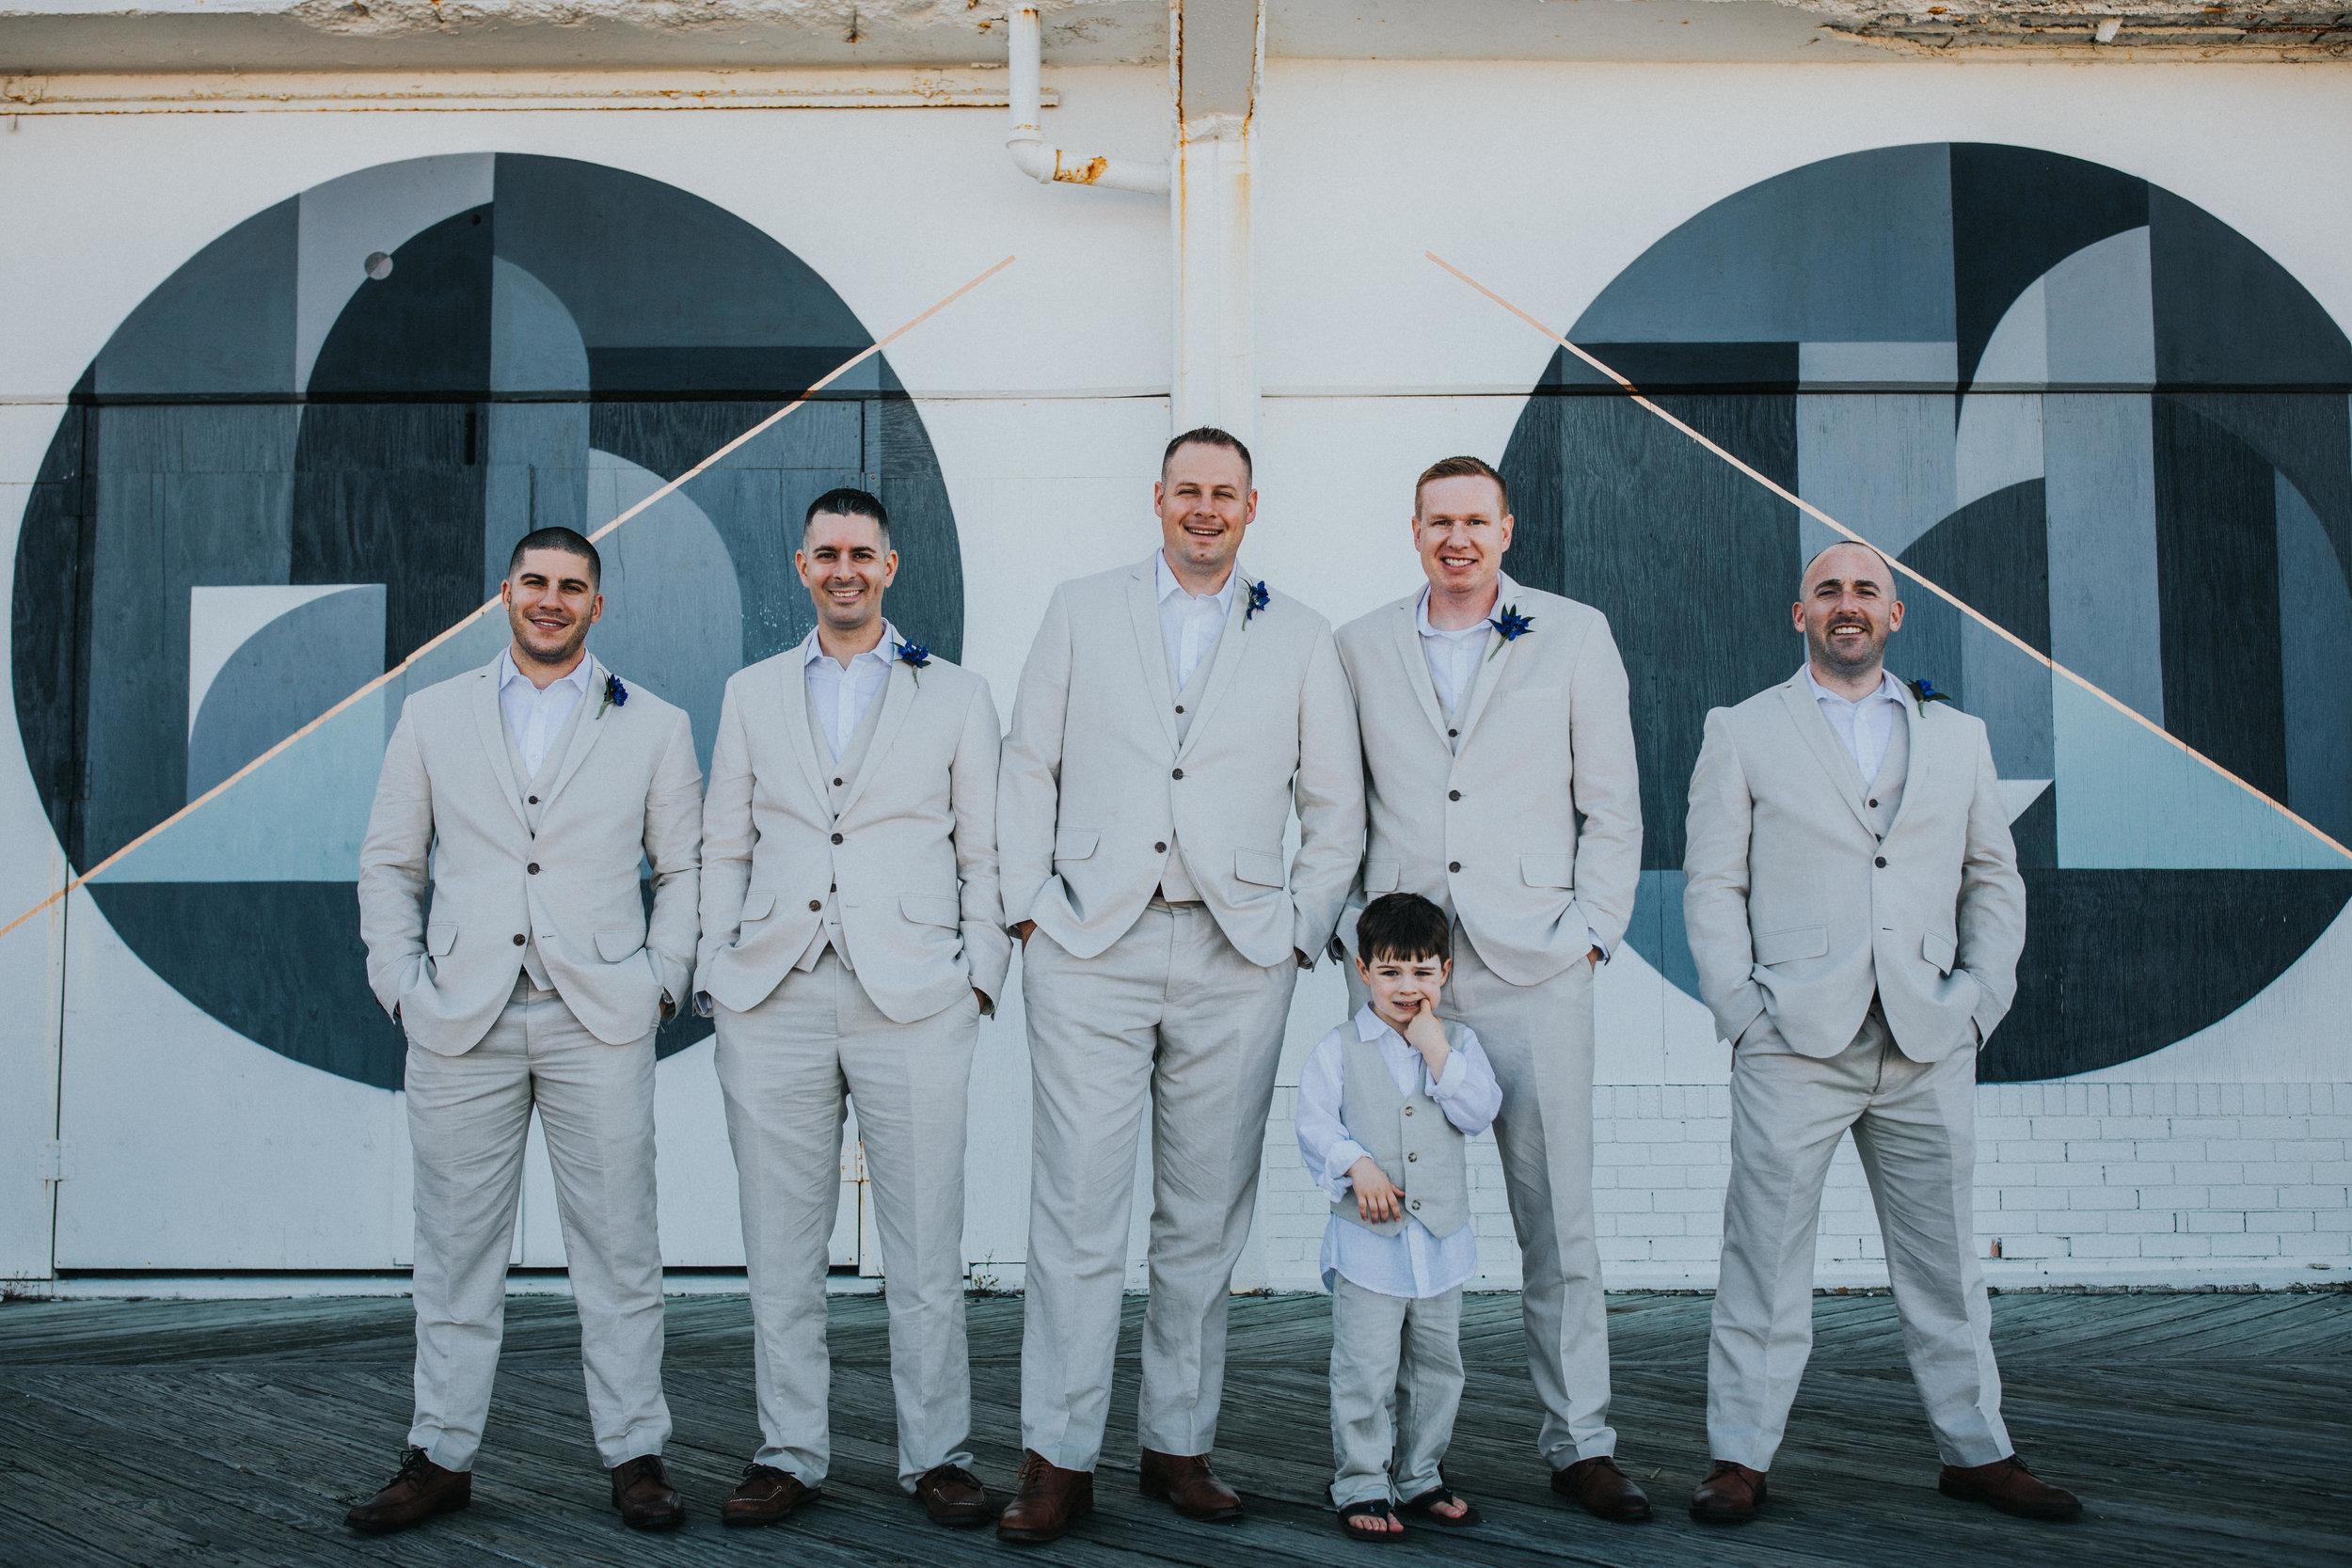 JennaLynnPhotography-NJWeddingPhotographer-Wedding-TheBerkeley-AsburyPark-Allison&Michael-BridalParty-40.jpg